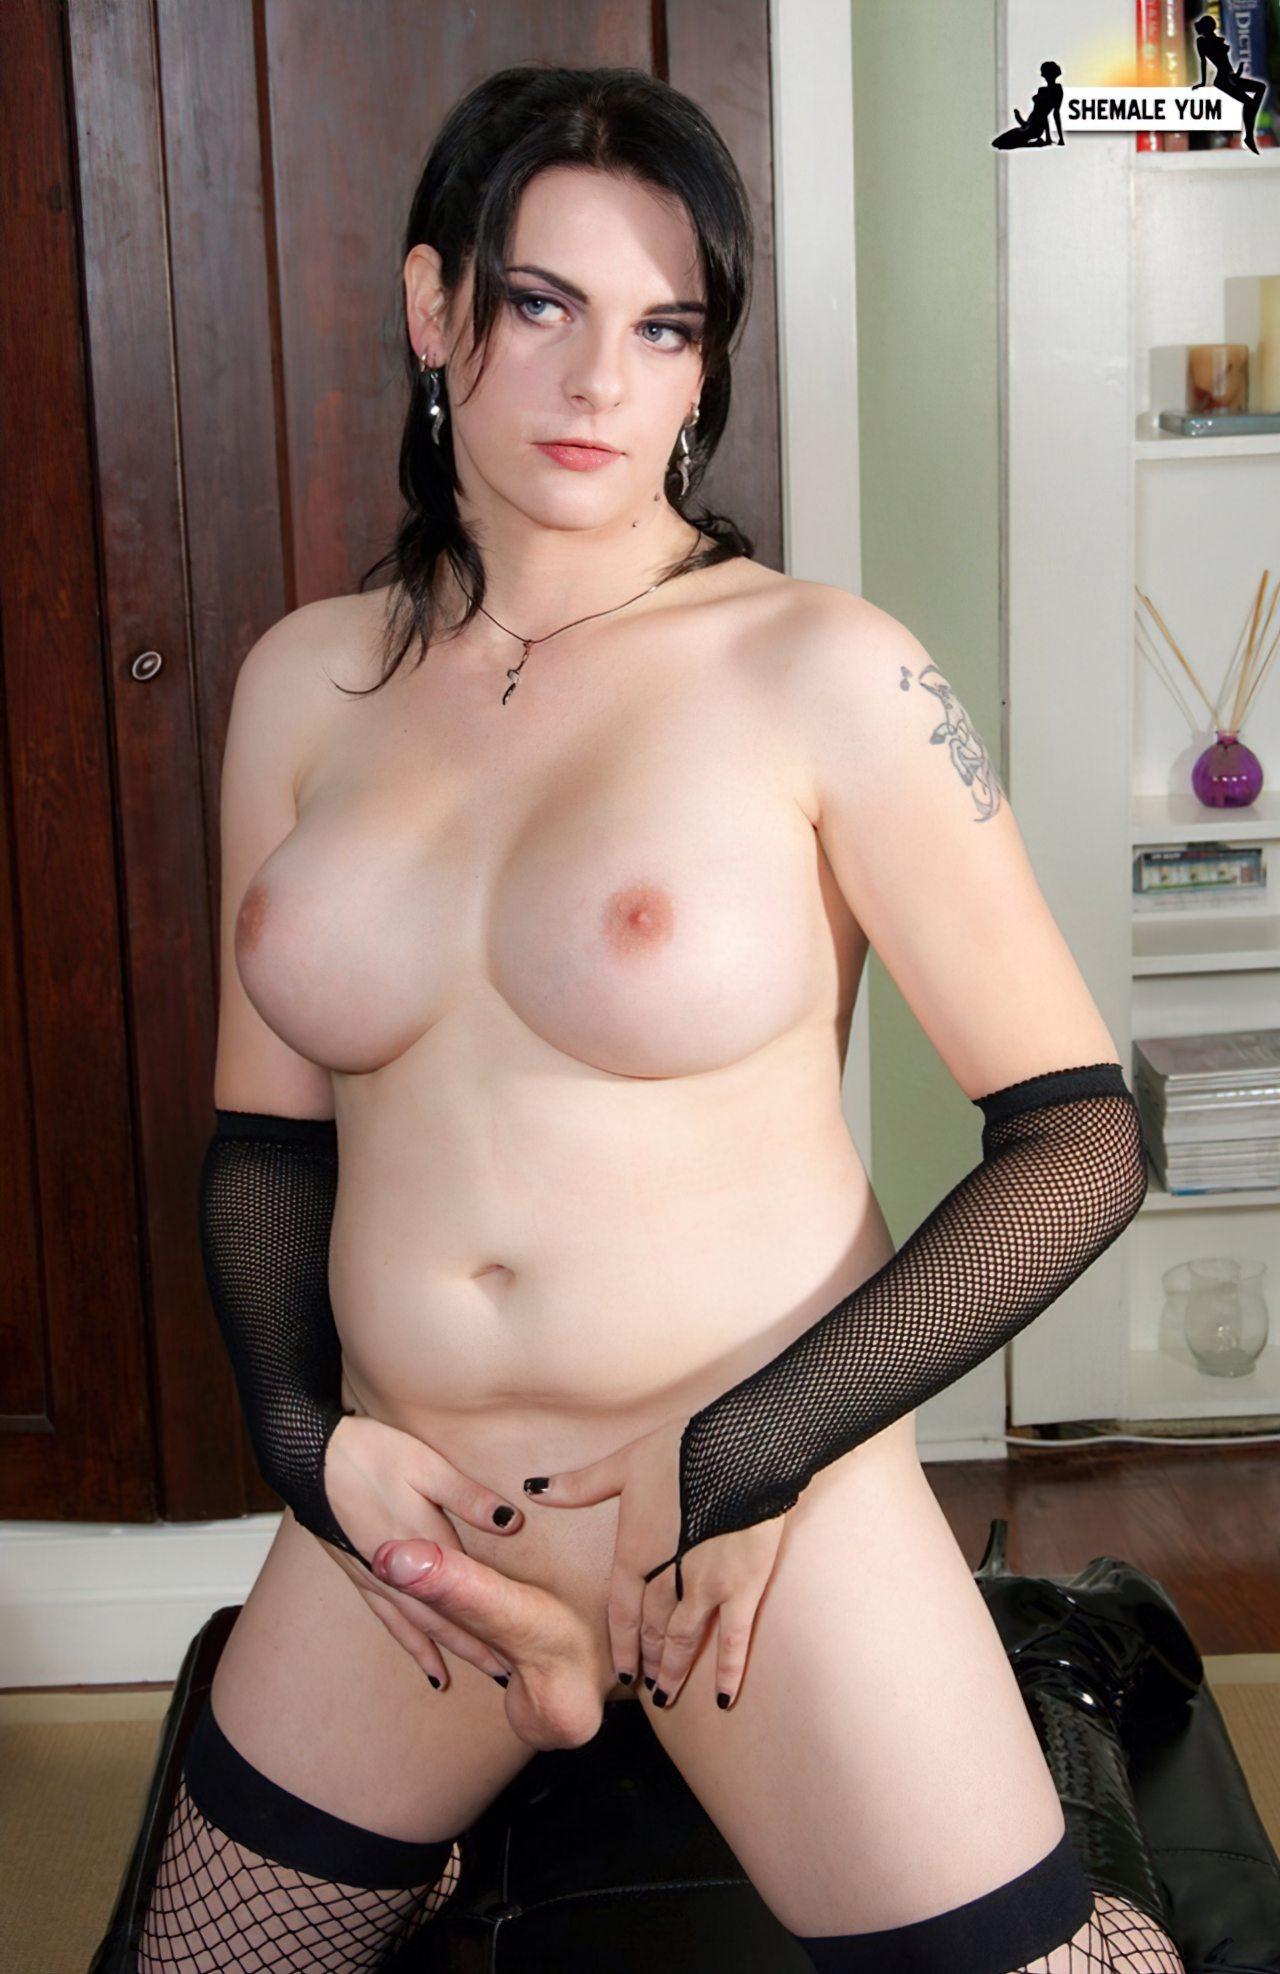 bonito transexual